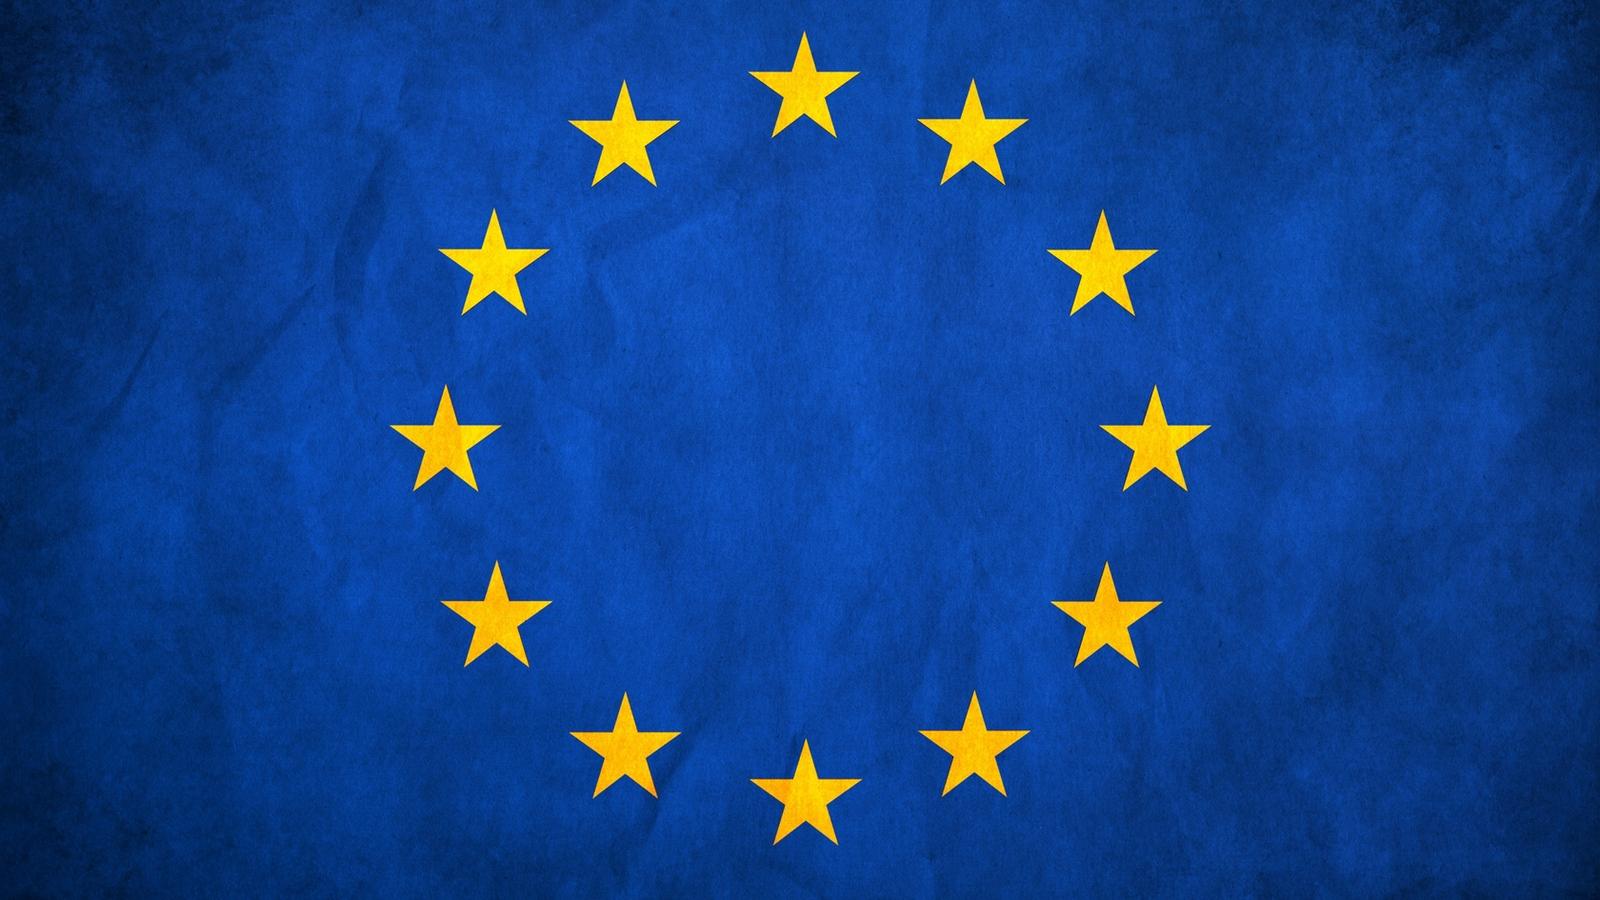 Download wallpaper 1600x900 european union flag stars europe 1600x900